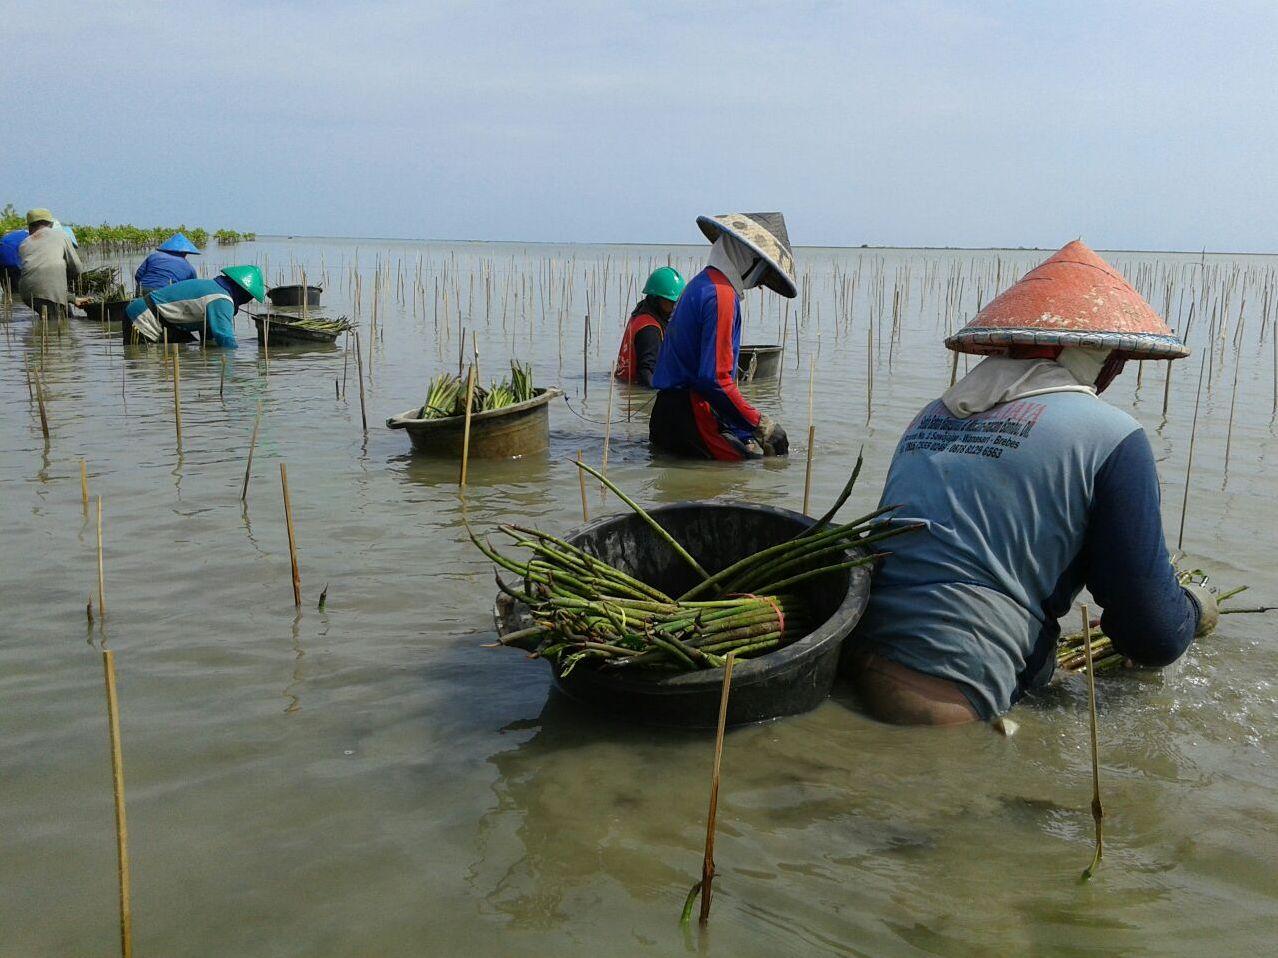 Penanaman mangrove sistem propagul oleh KPSA Wana Lestari di pesisir Desa Sawojajar, Brebes. (Foto: Dokumentasi pribadi).